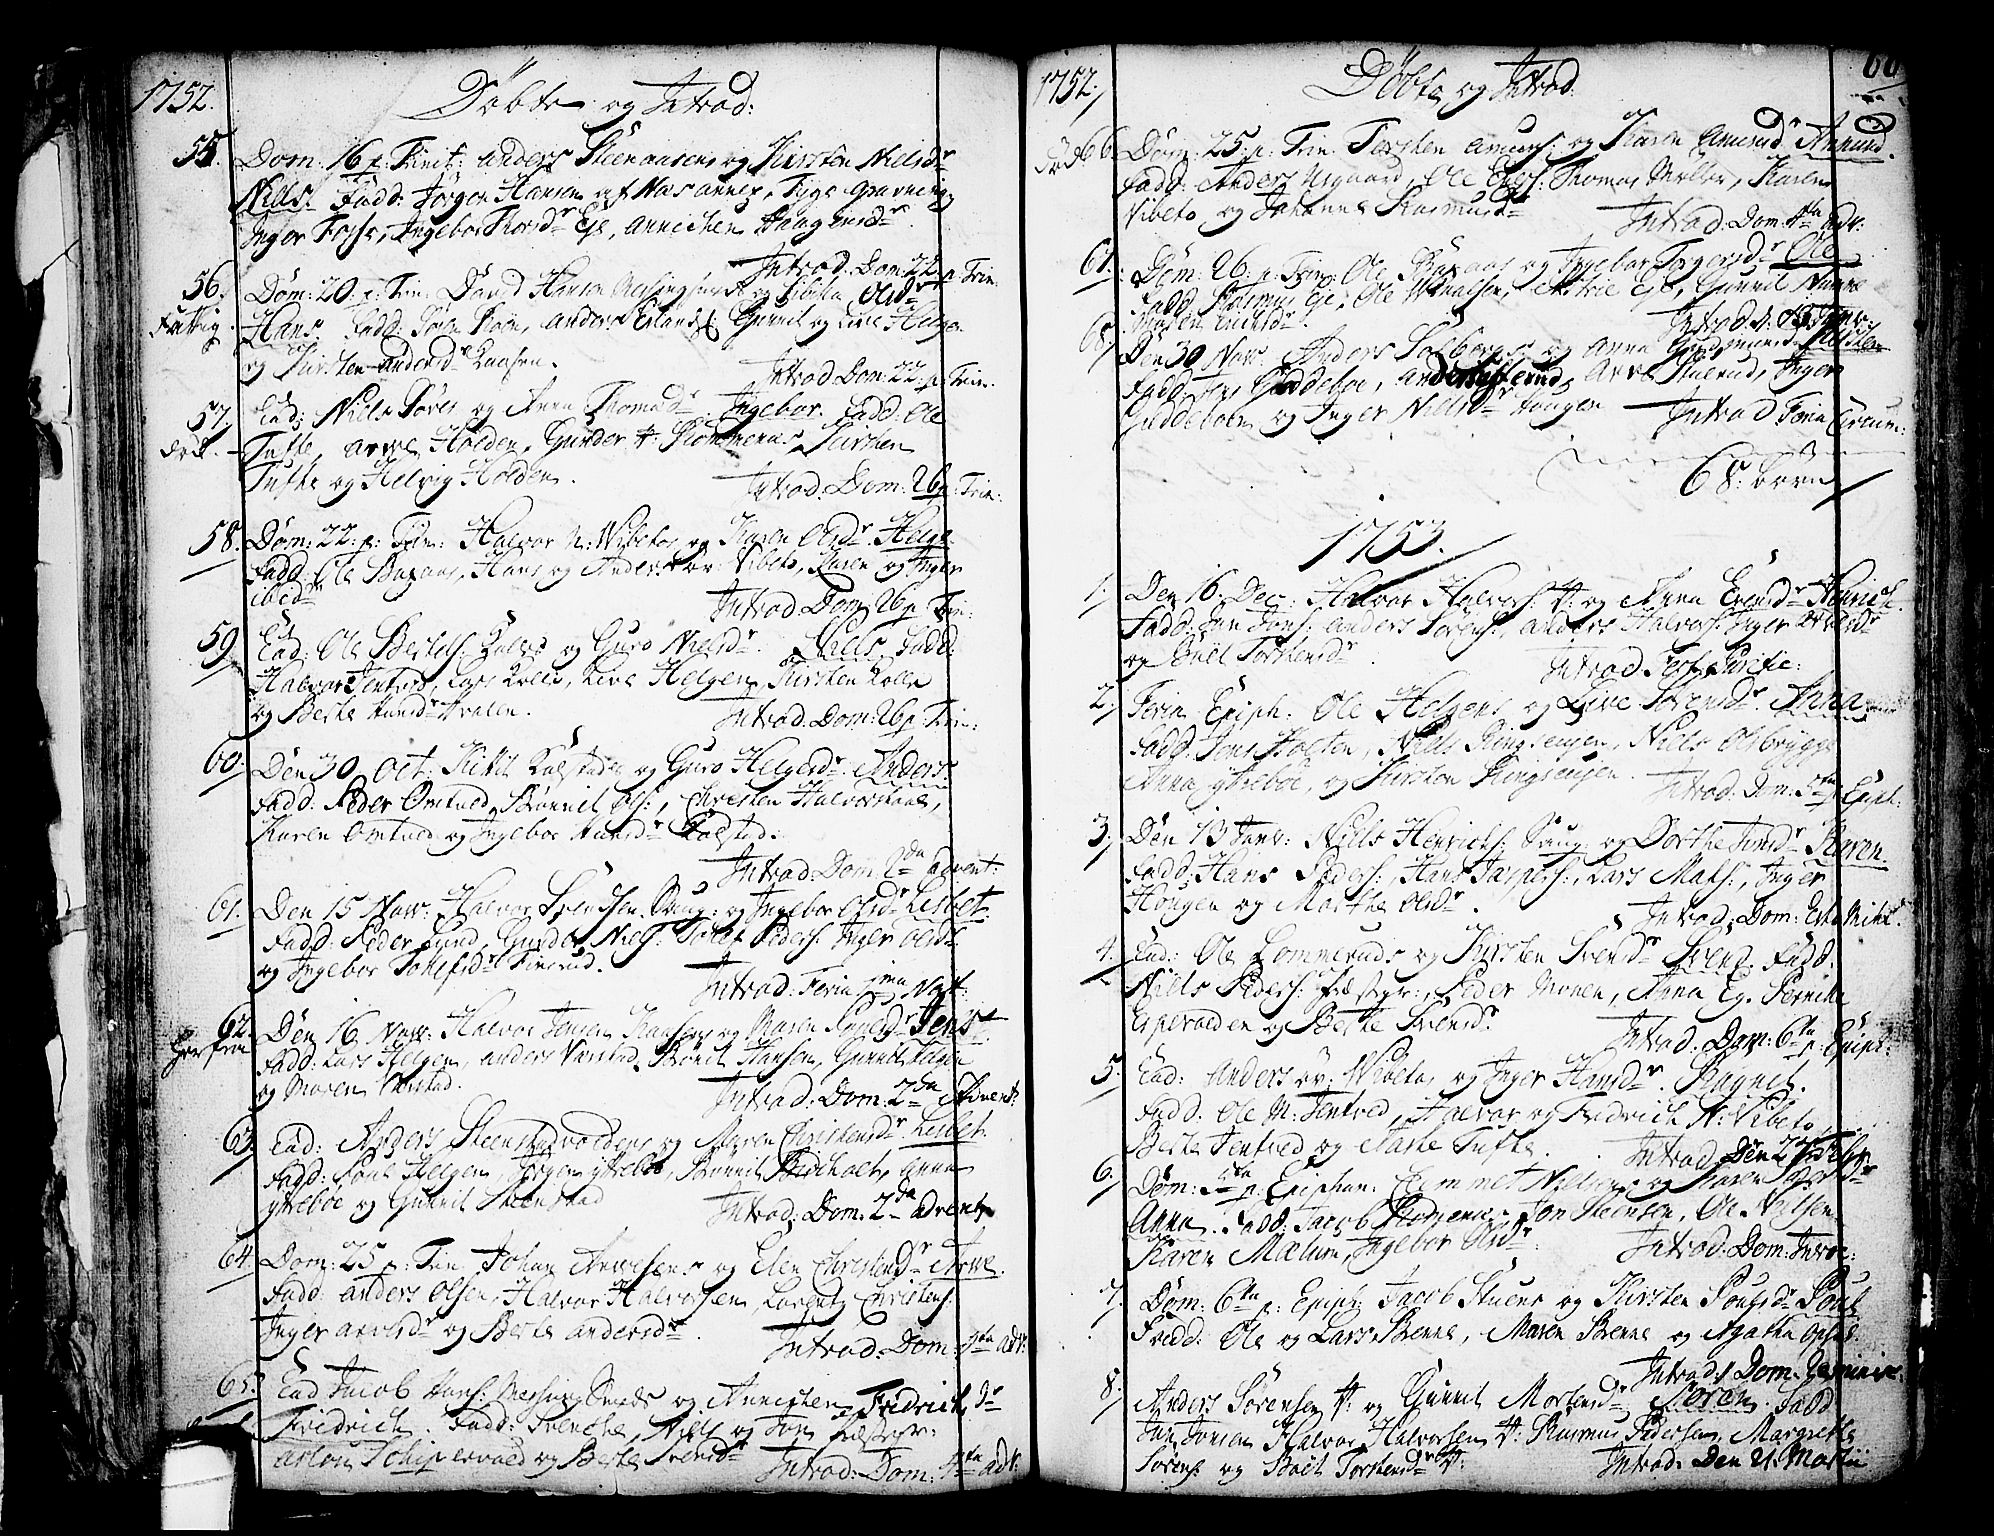 SAKO, Holla kirkebøker, F/Fa/L0001: Ministerialbok nr. 1, 1717-1779, s. 60